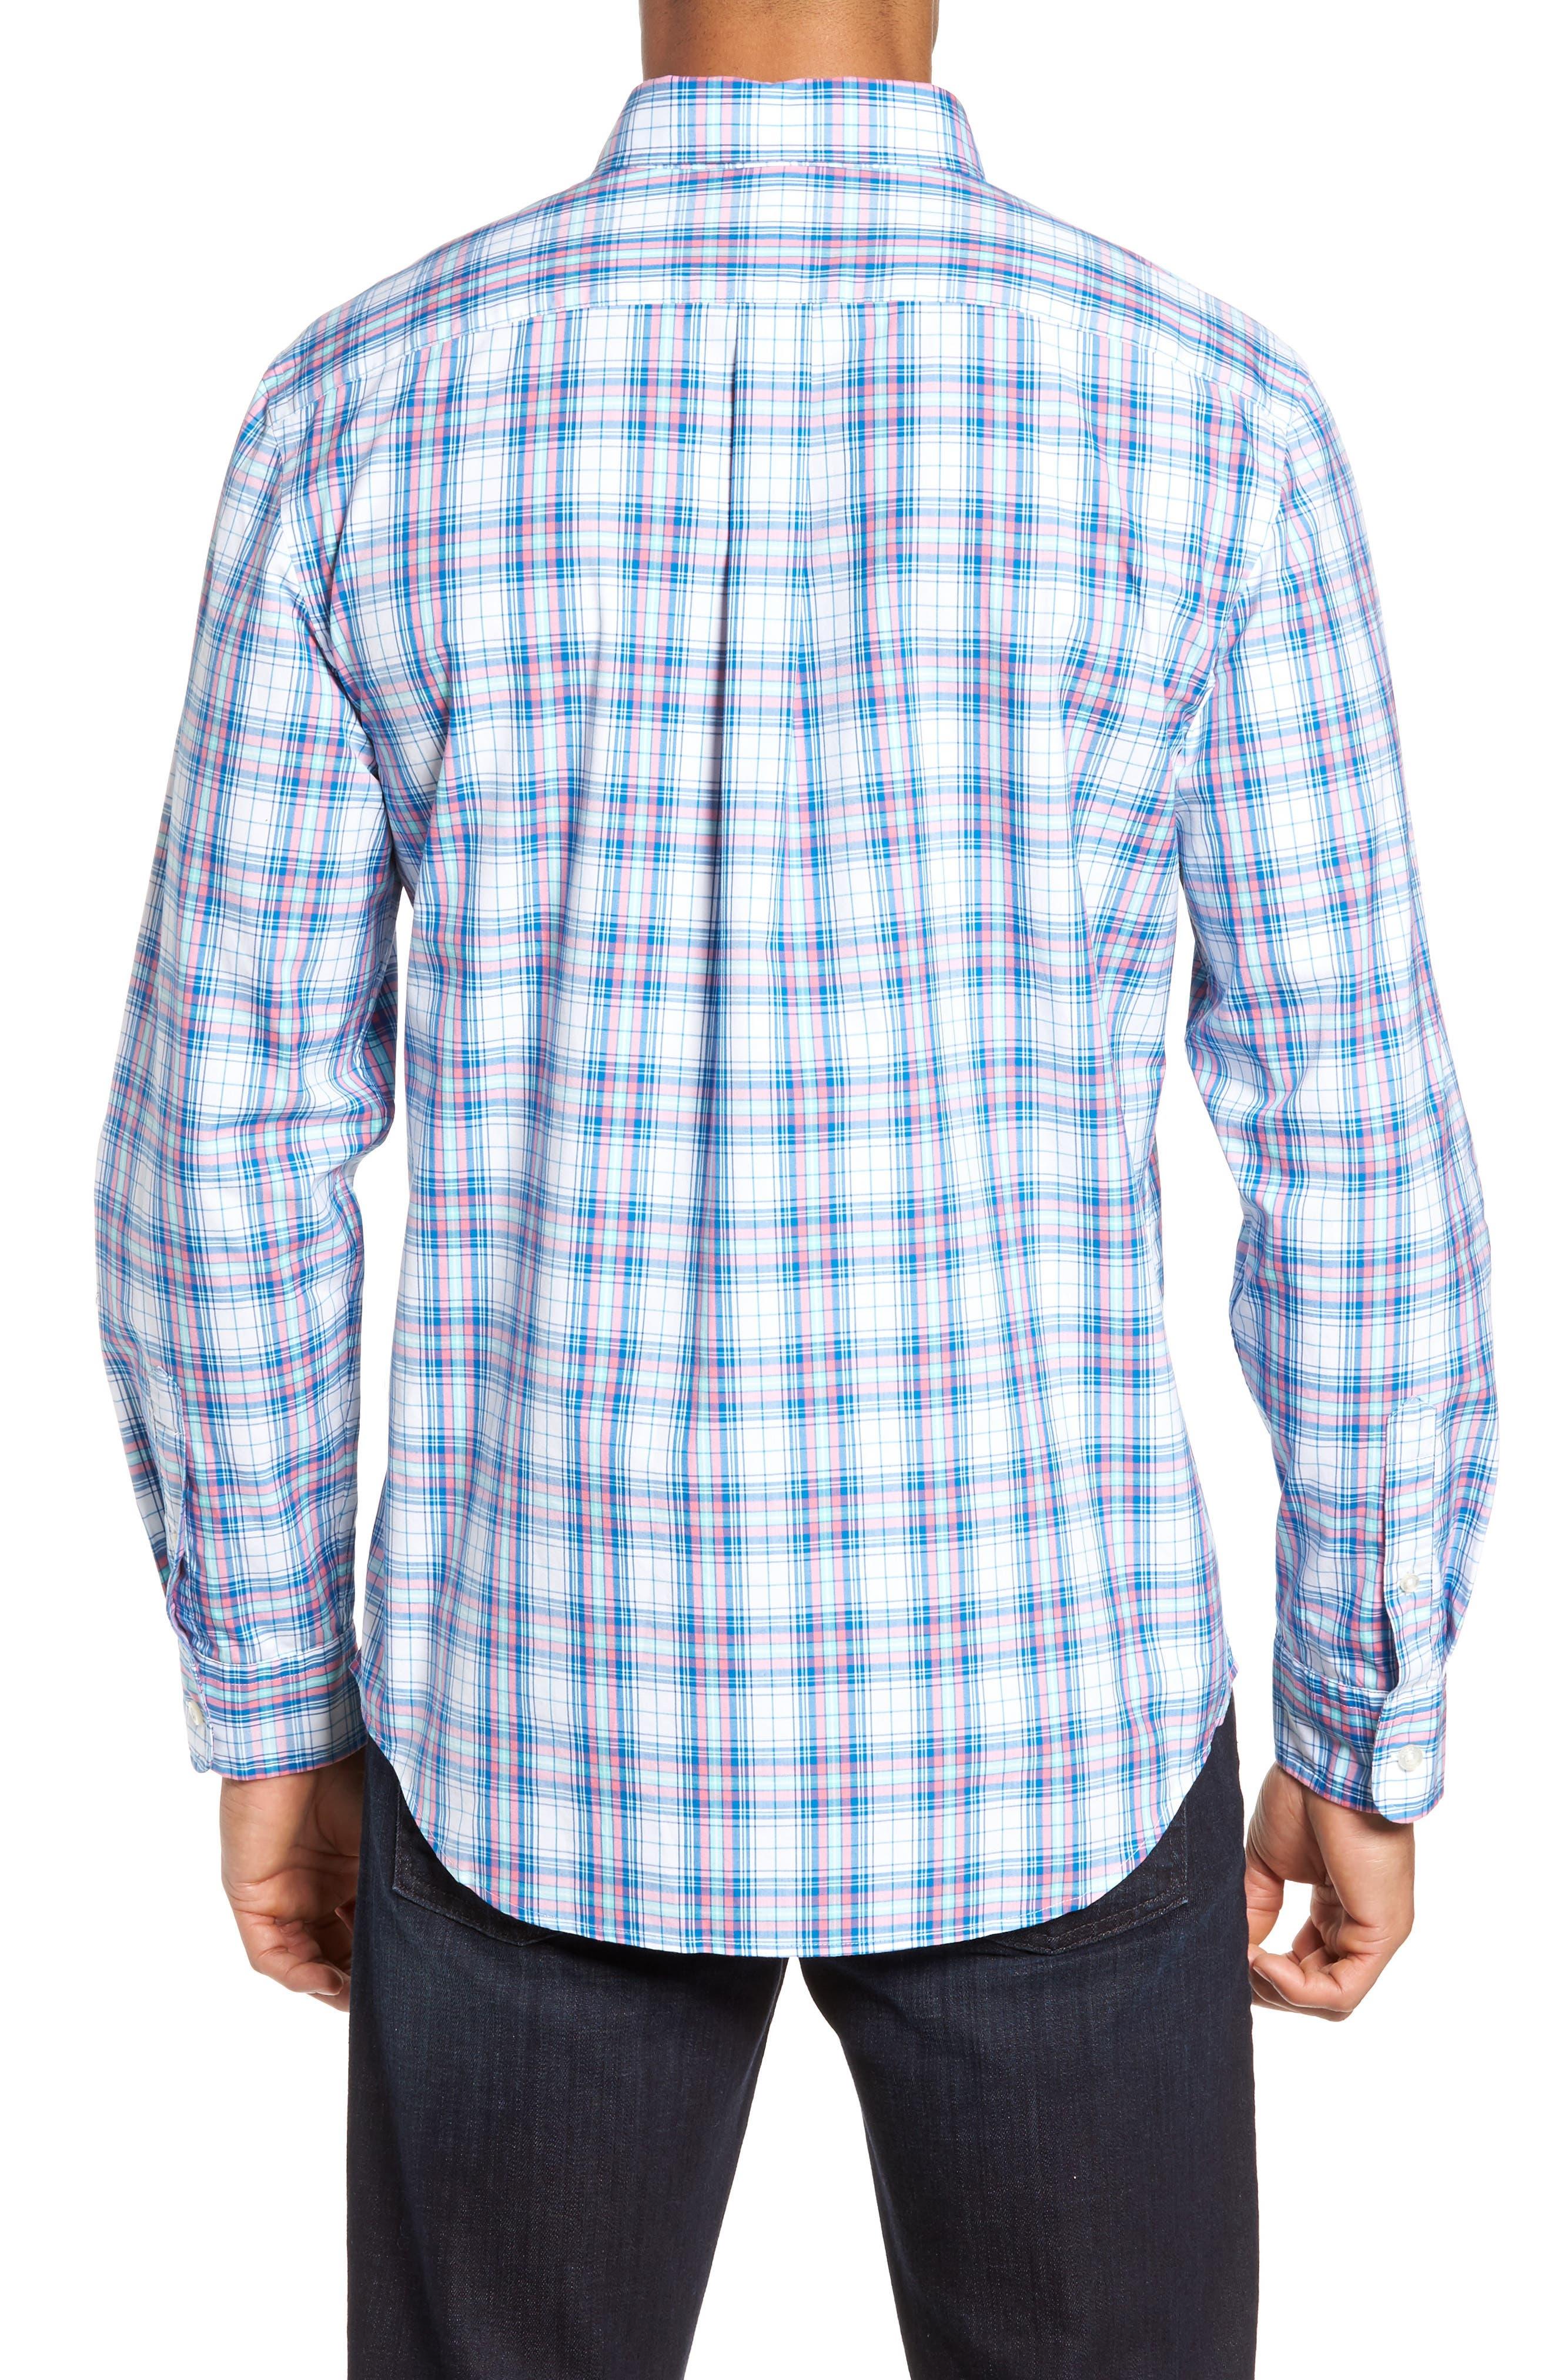 Tucker Sunset Pines Classic Fit Plaid Sport Shirt,                             Alternate thumbnail 2, color,                             650